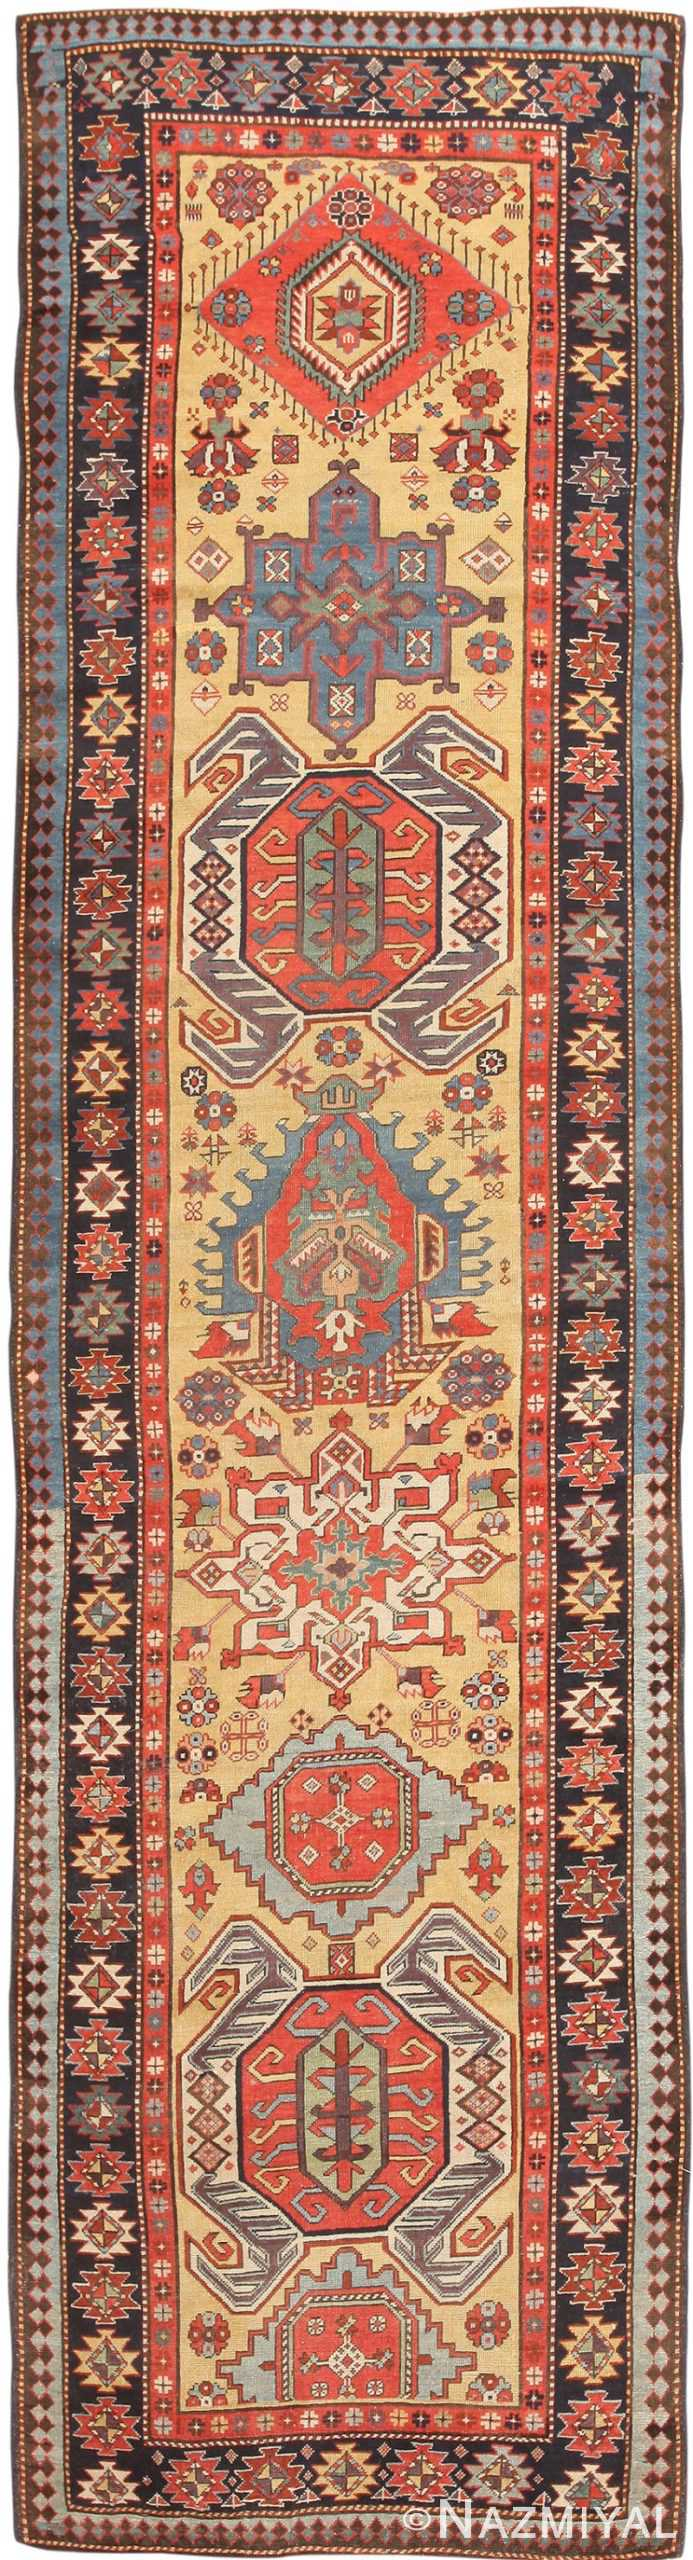 Antique Caucasian Lenkoran / Talish Runner Rug 47264 Nazmiyal